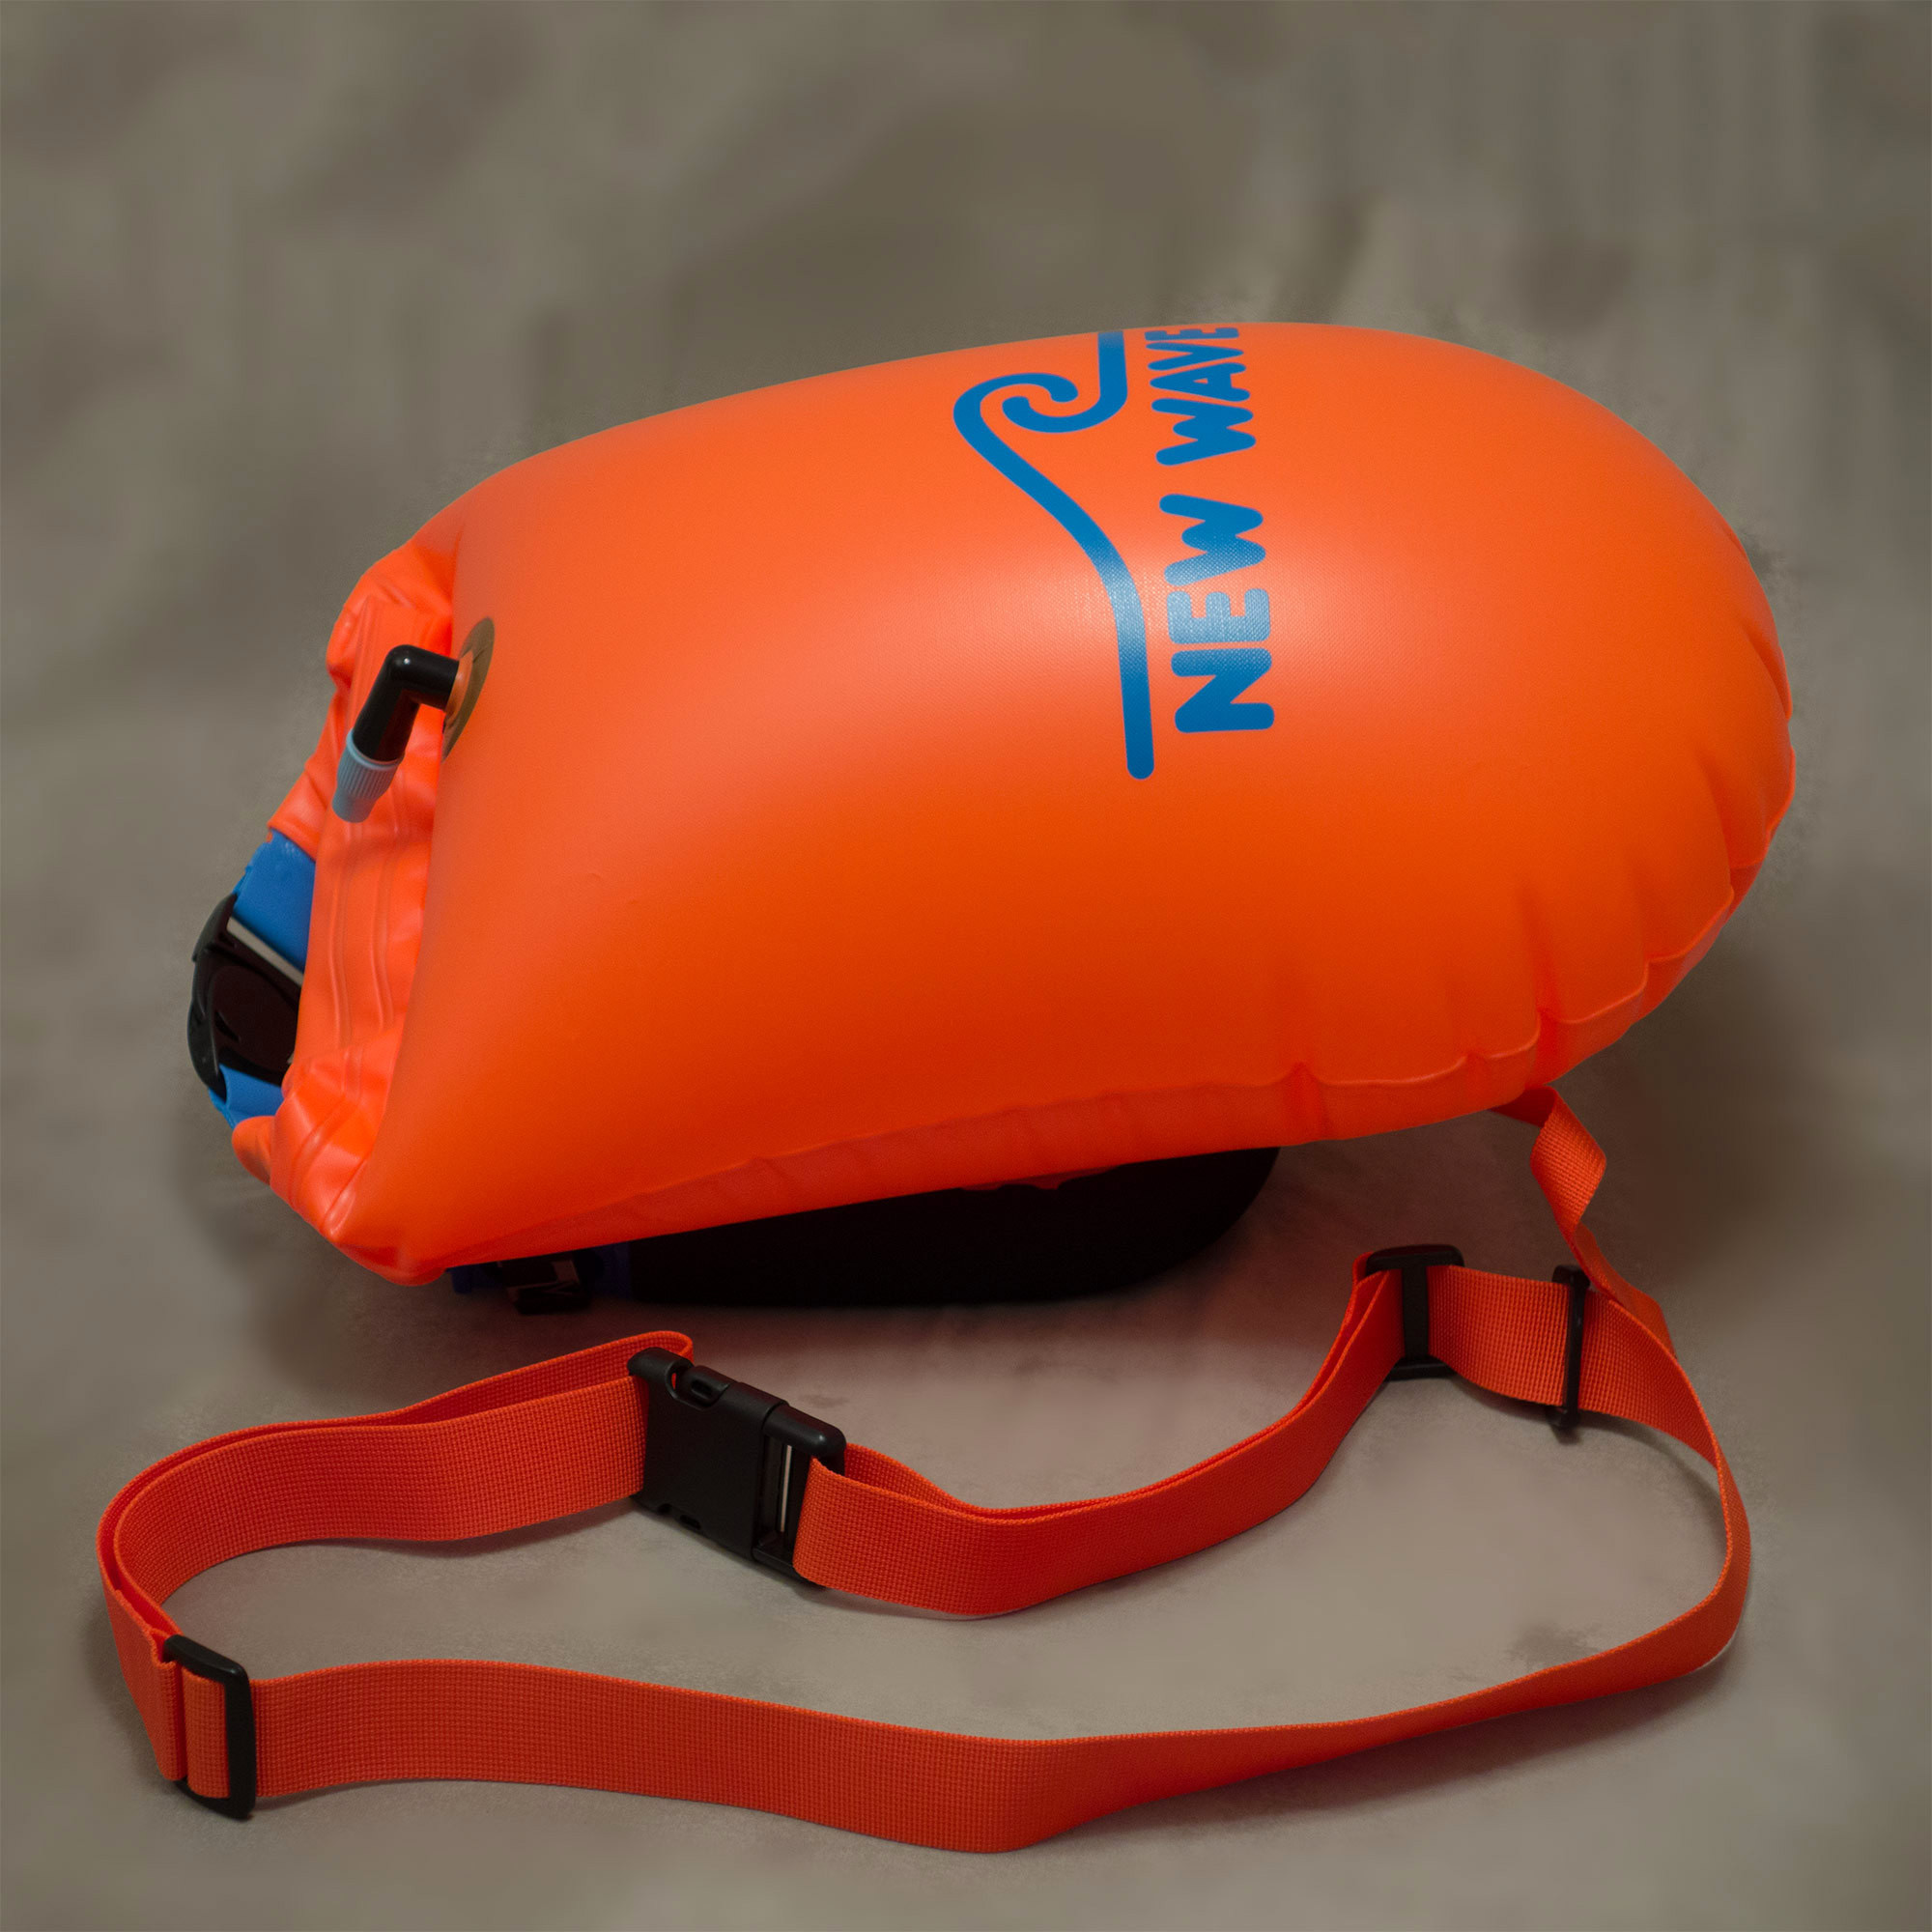 New Wave Open Water Swim Buoy Large (20 liter) PVC Orange by